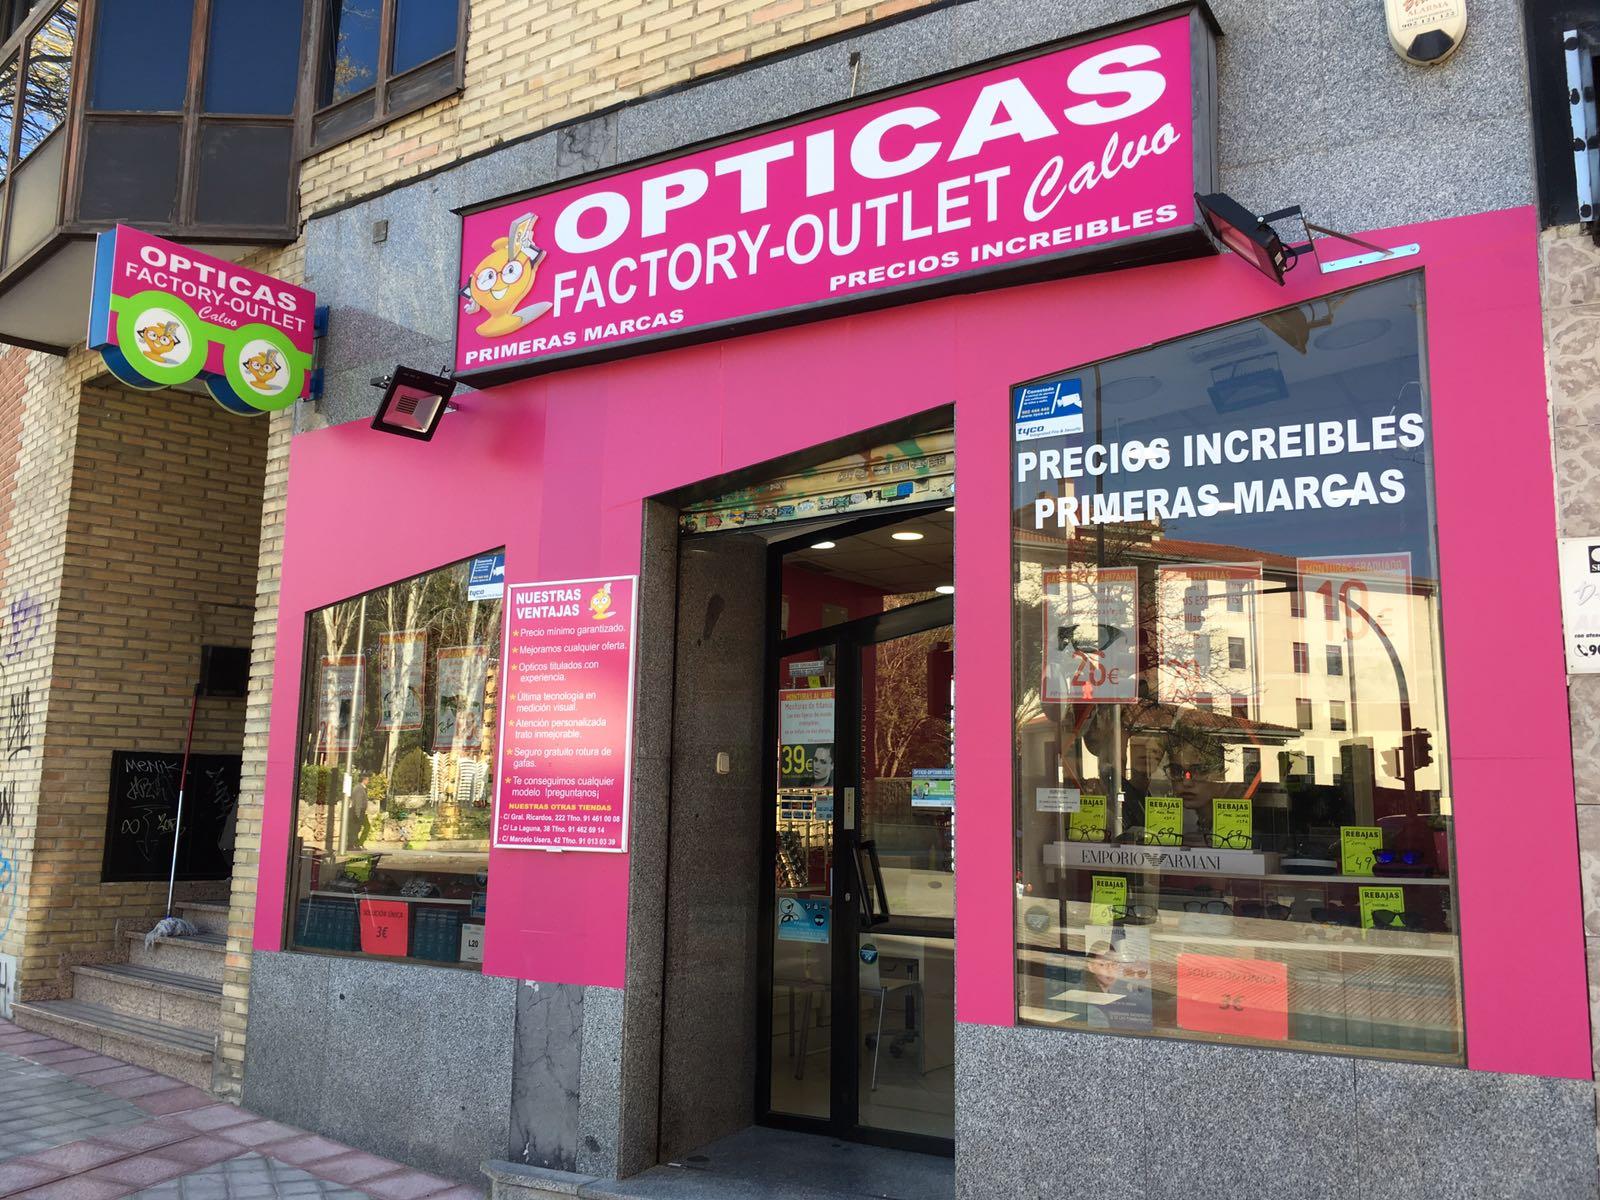 ad182a12eb Ópticas Factory-Outlet en Carabanchel - Guia Comercial Madrid